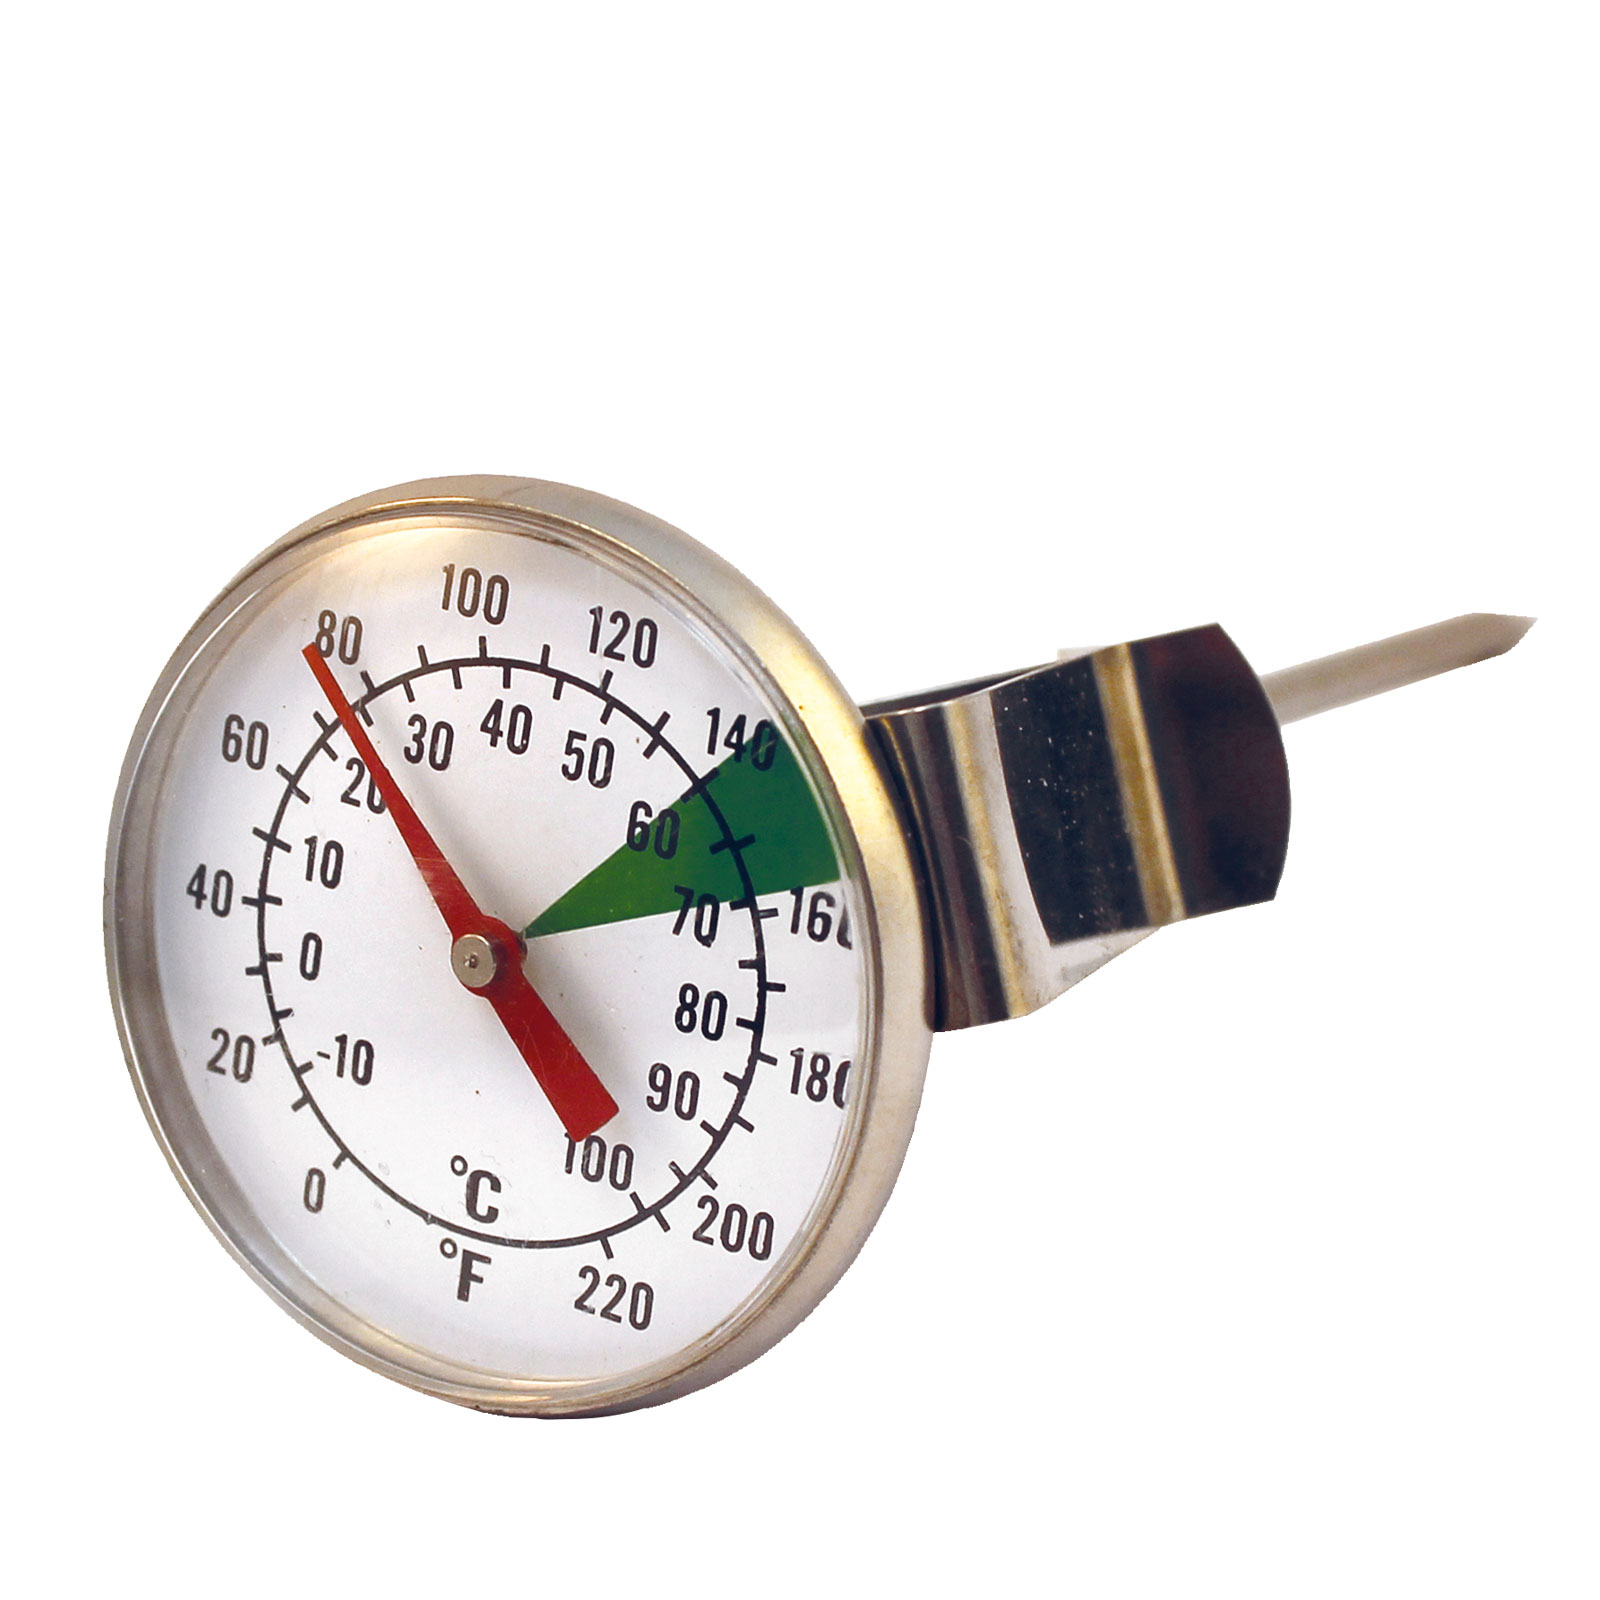 Analog Barista-Thermometer ø 45 mm, Milch-Thermometer Barista Zubehör